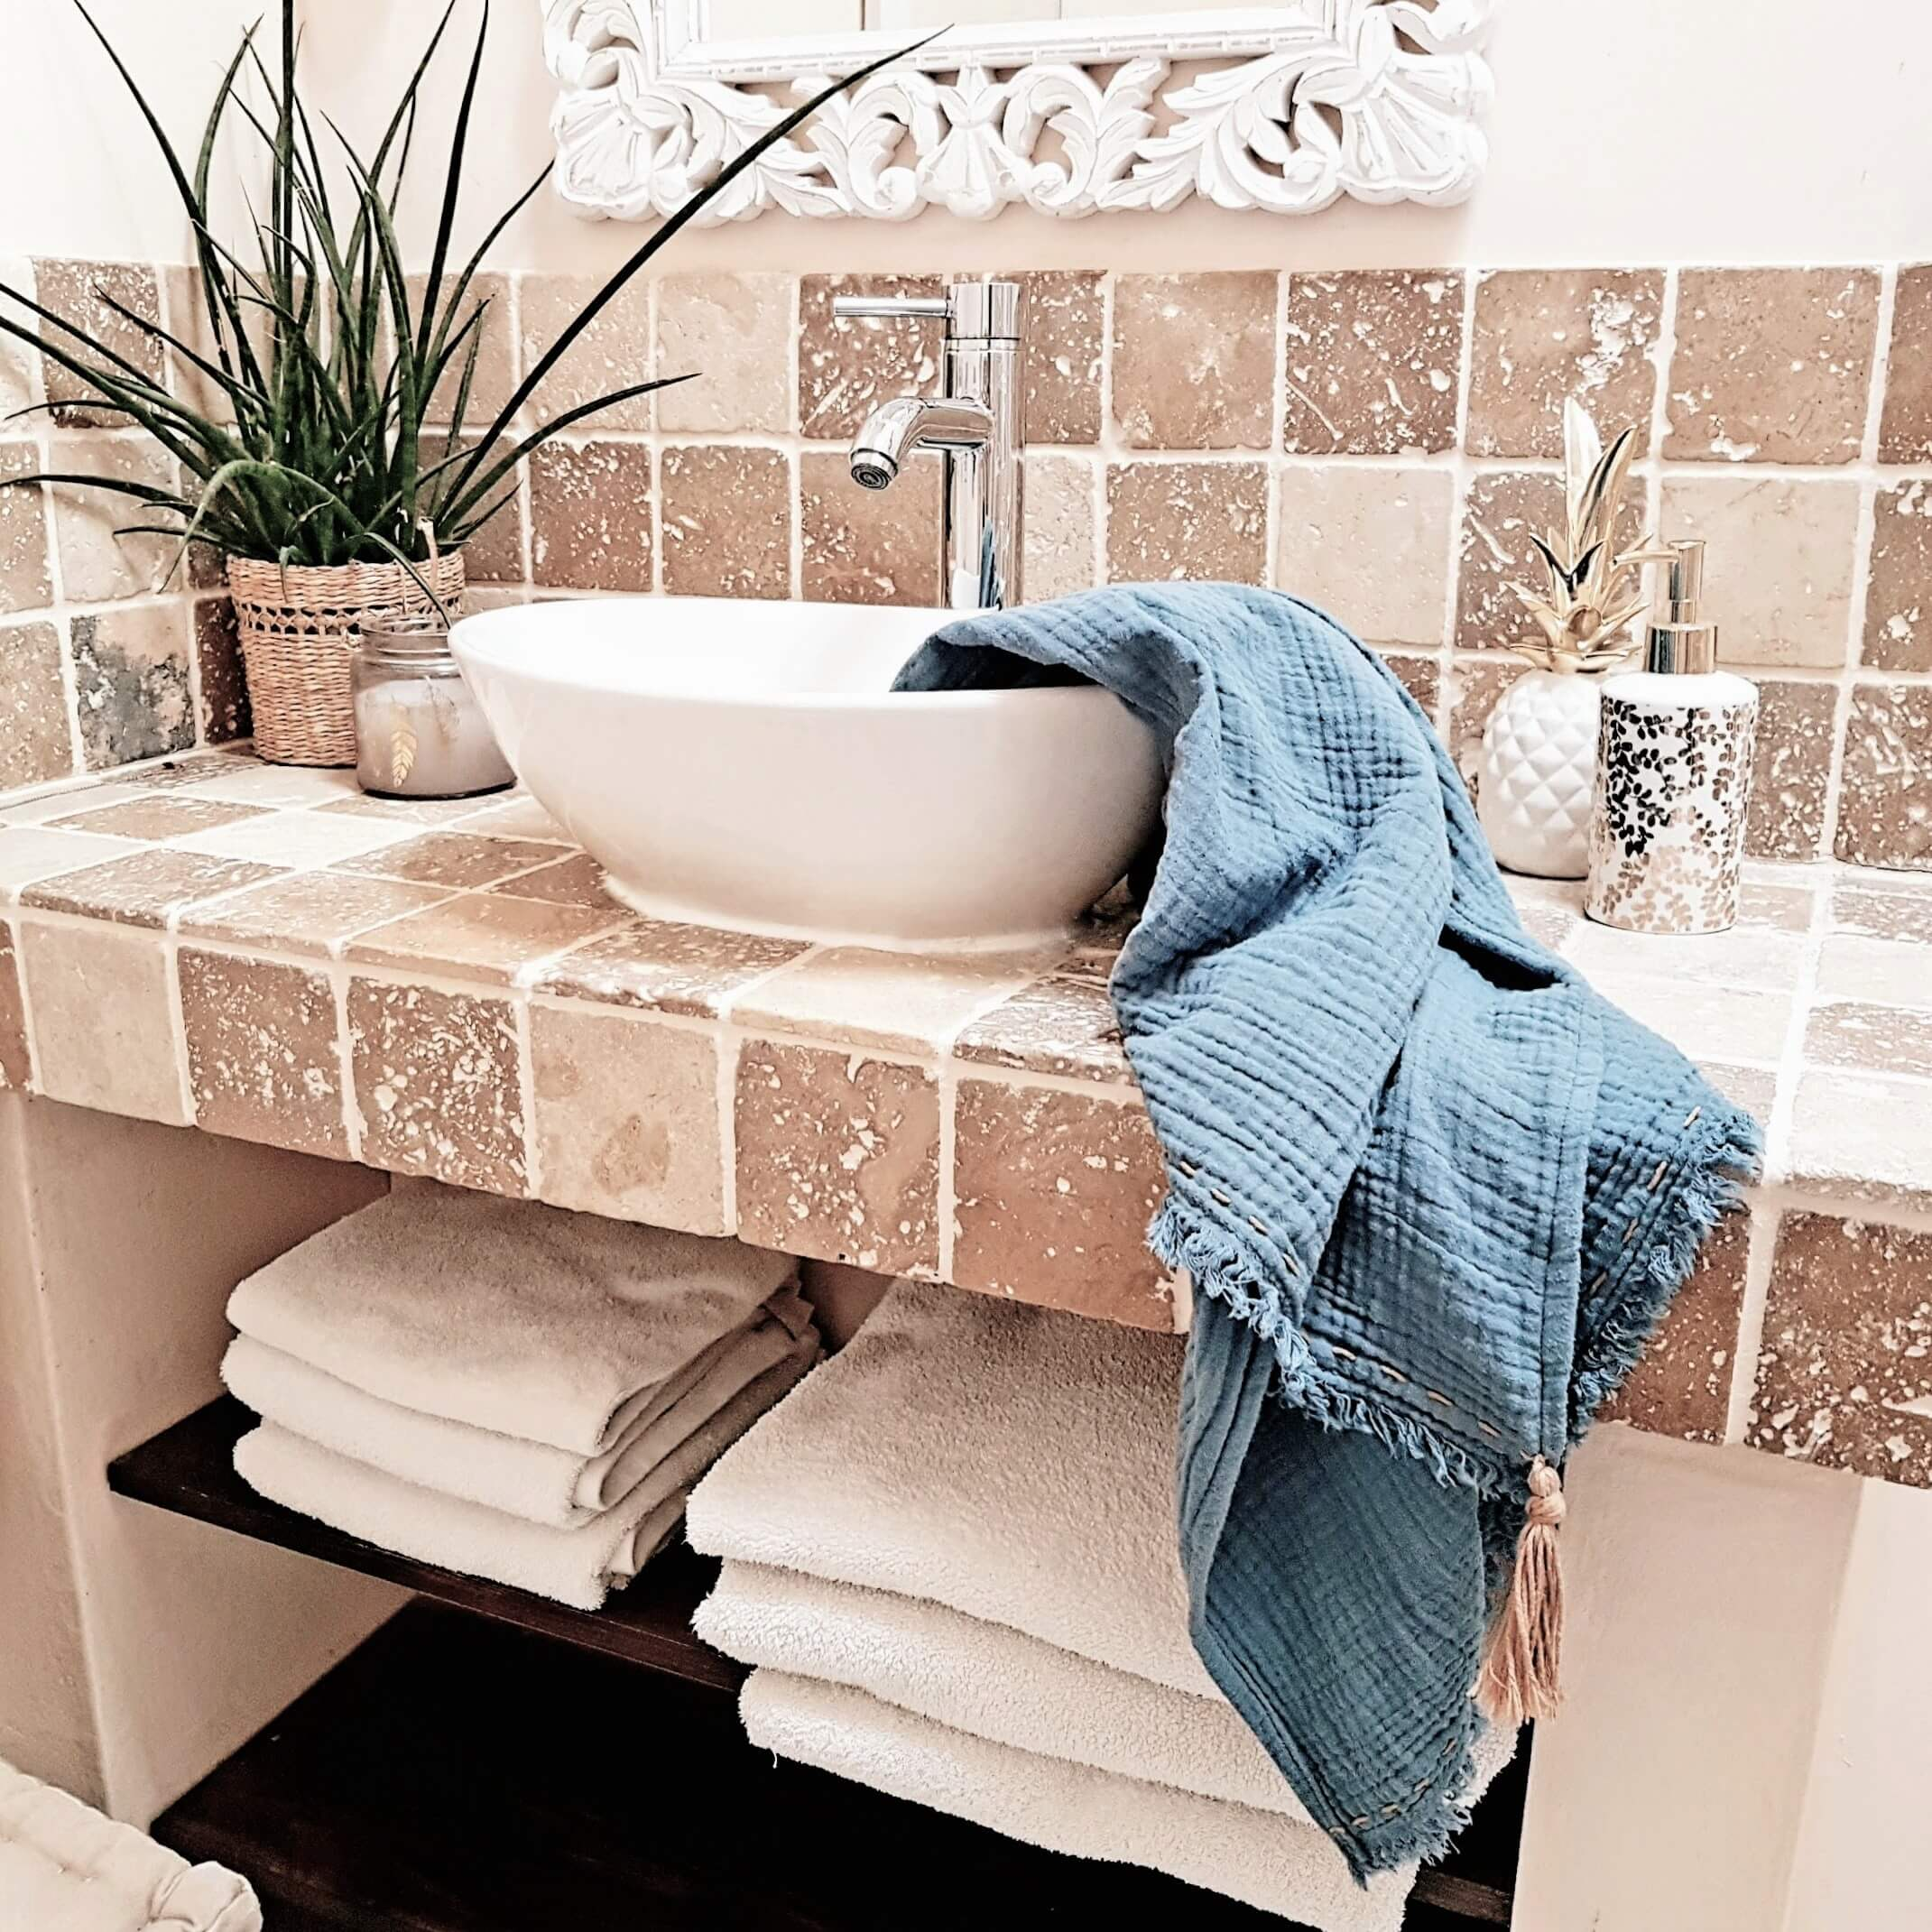 linibini - Bath Towel